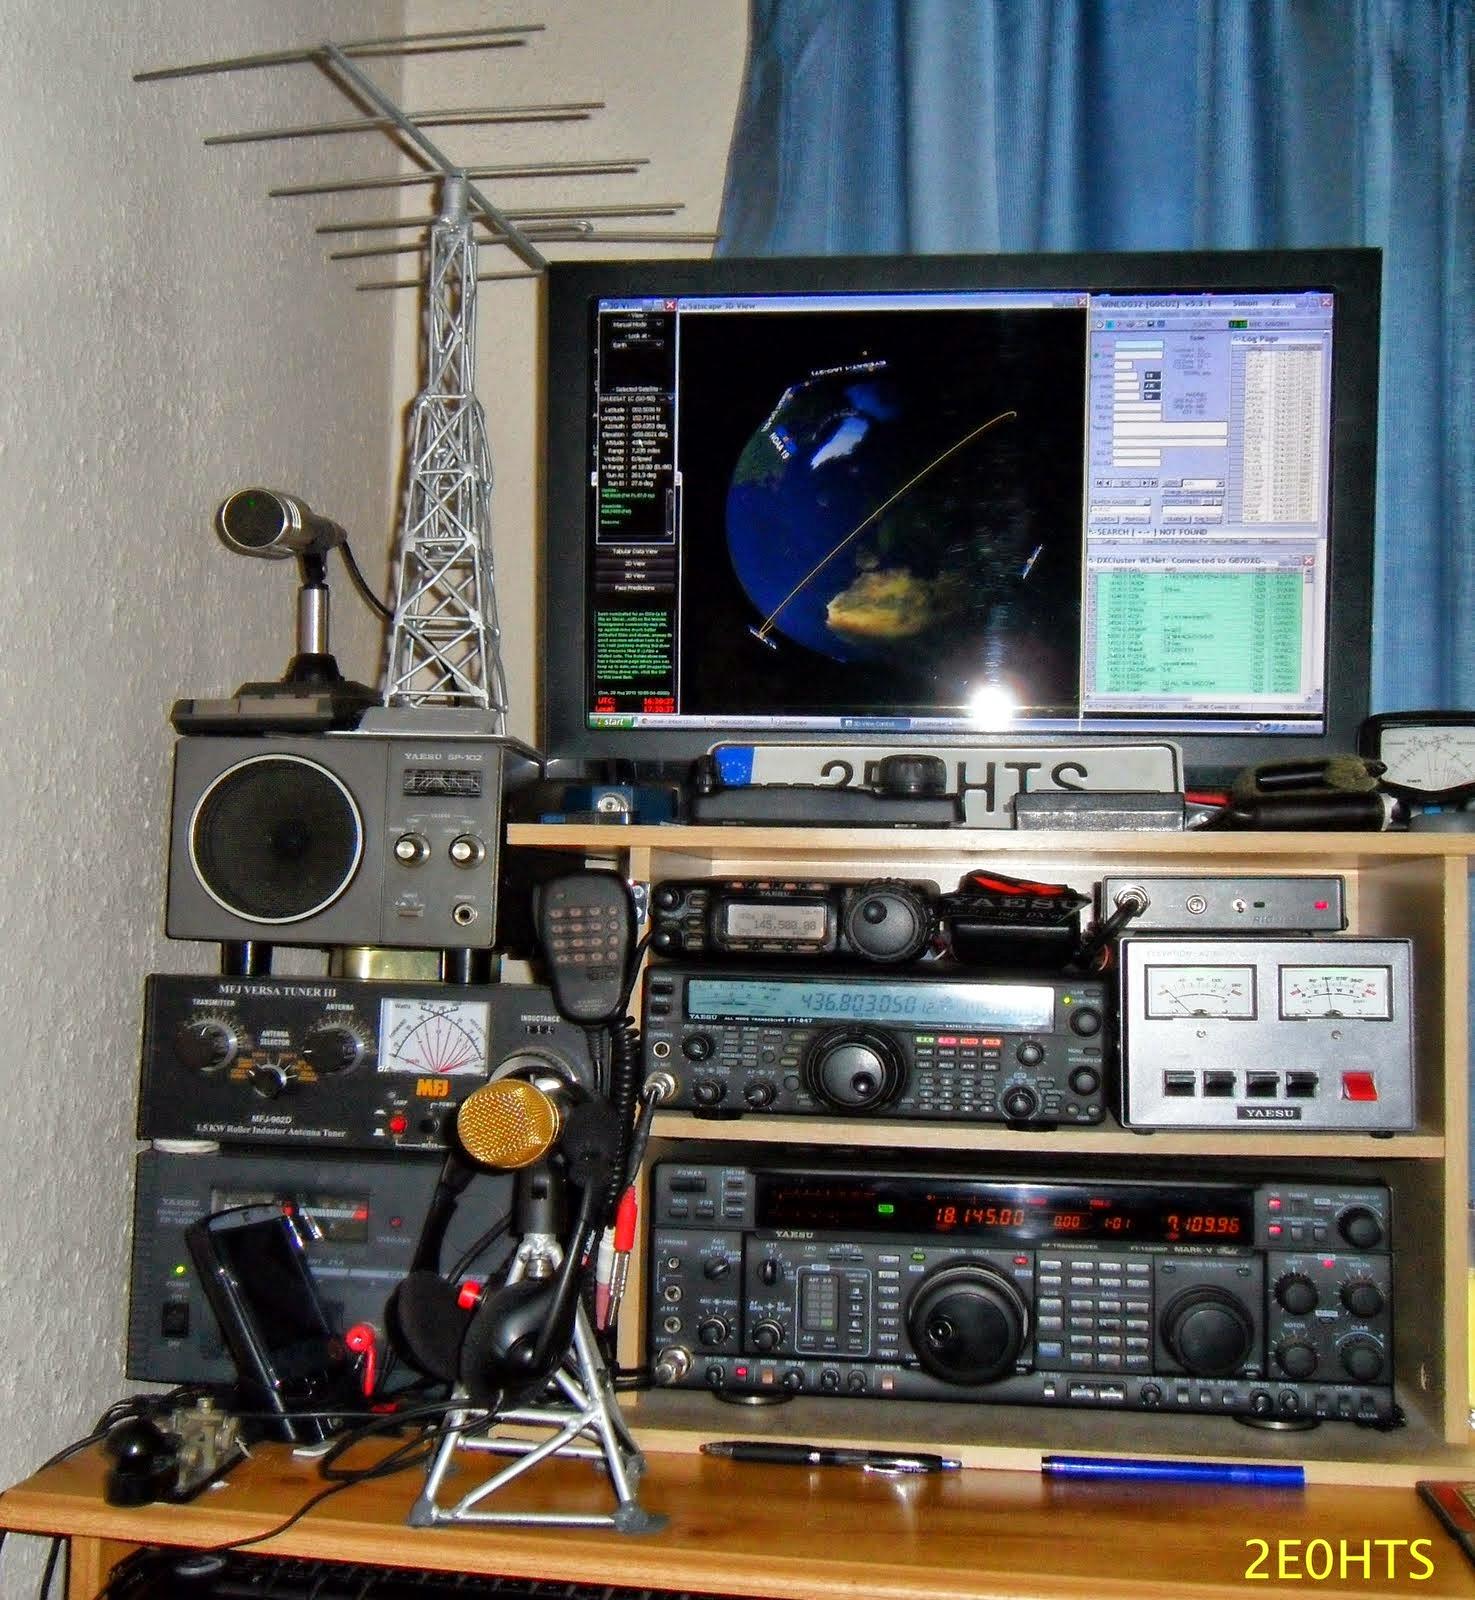 Used amateur equipment